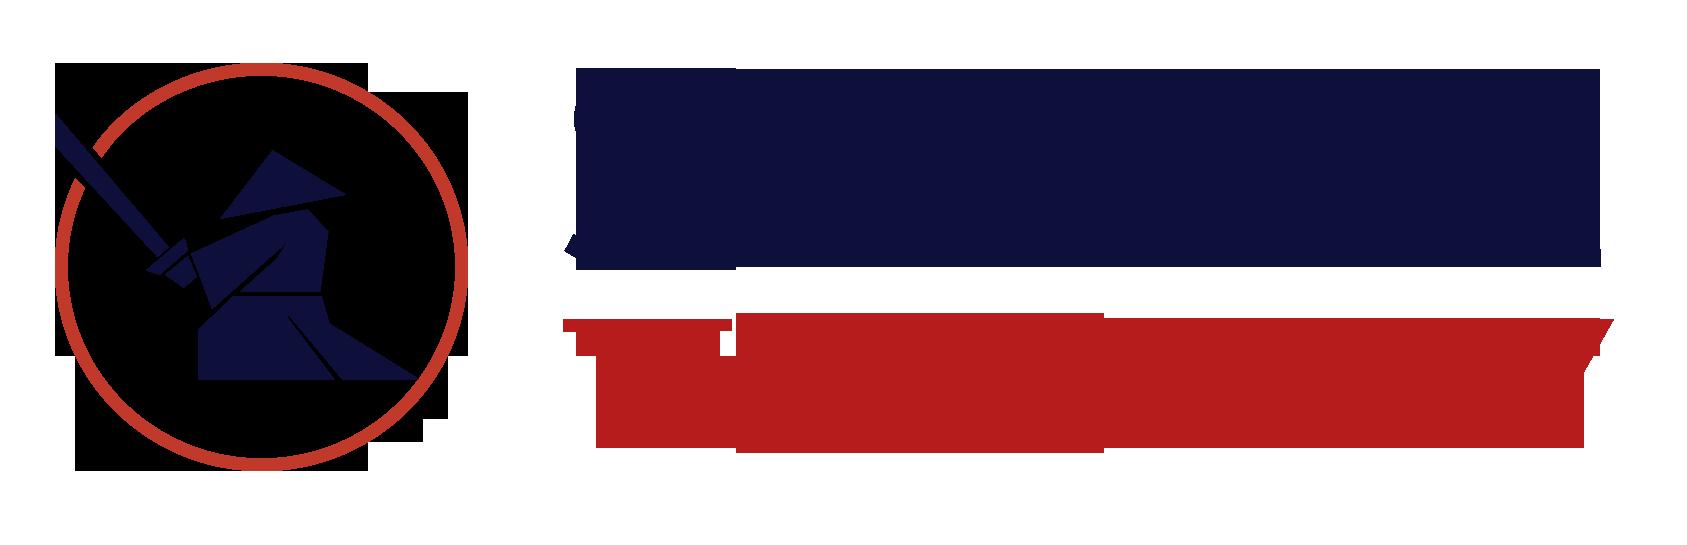 Stryke Technology